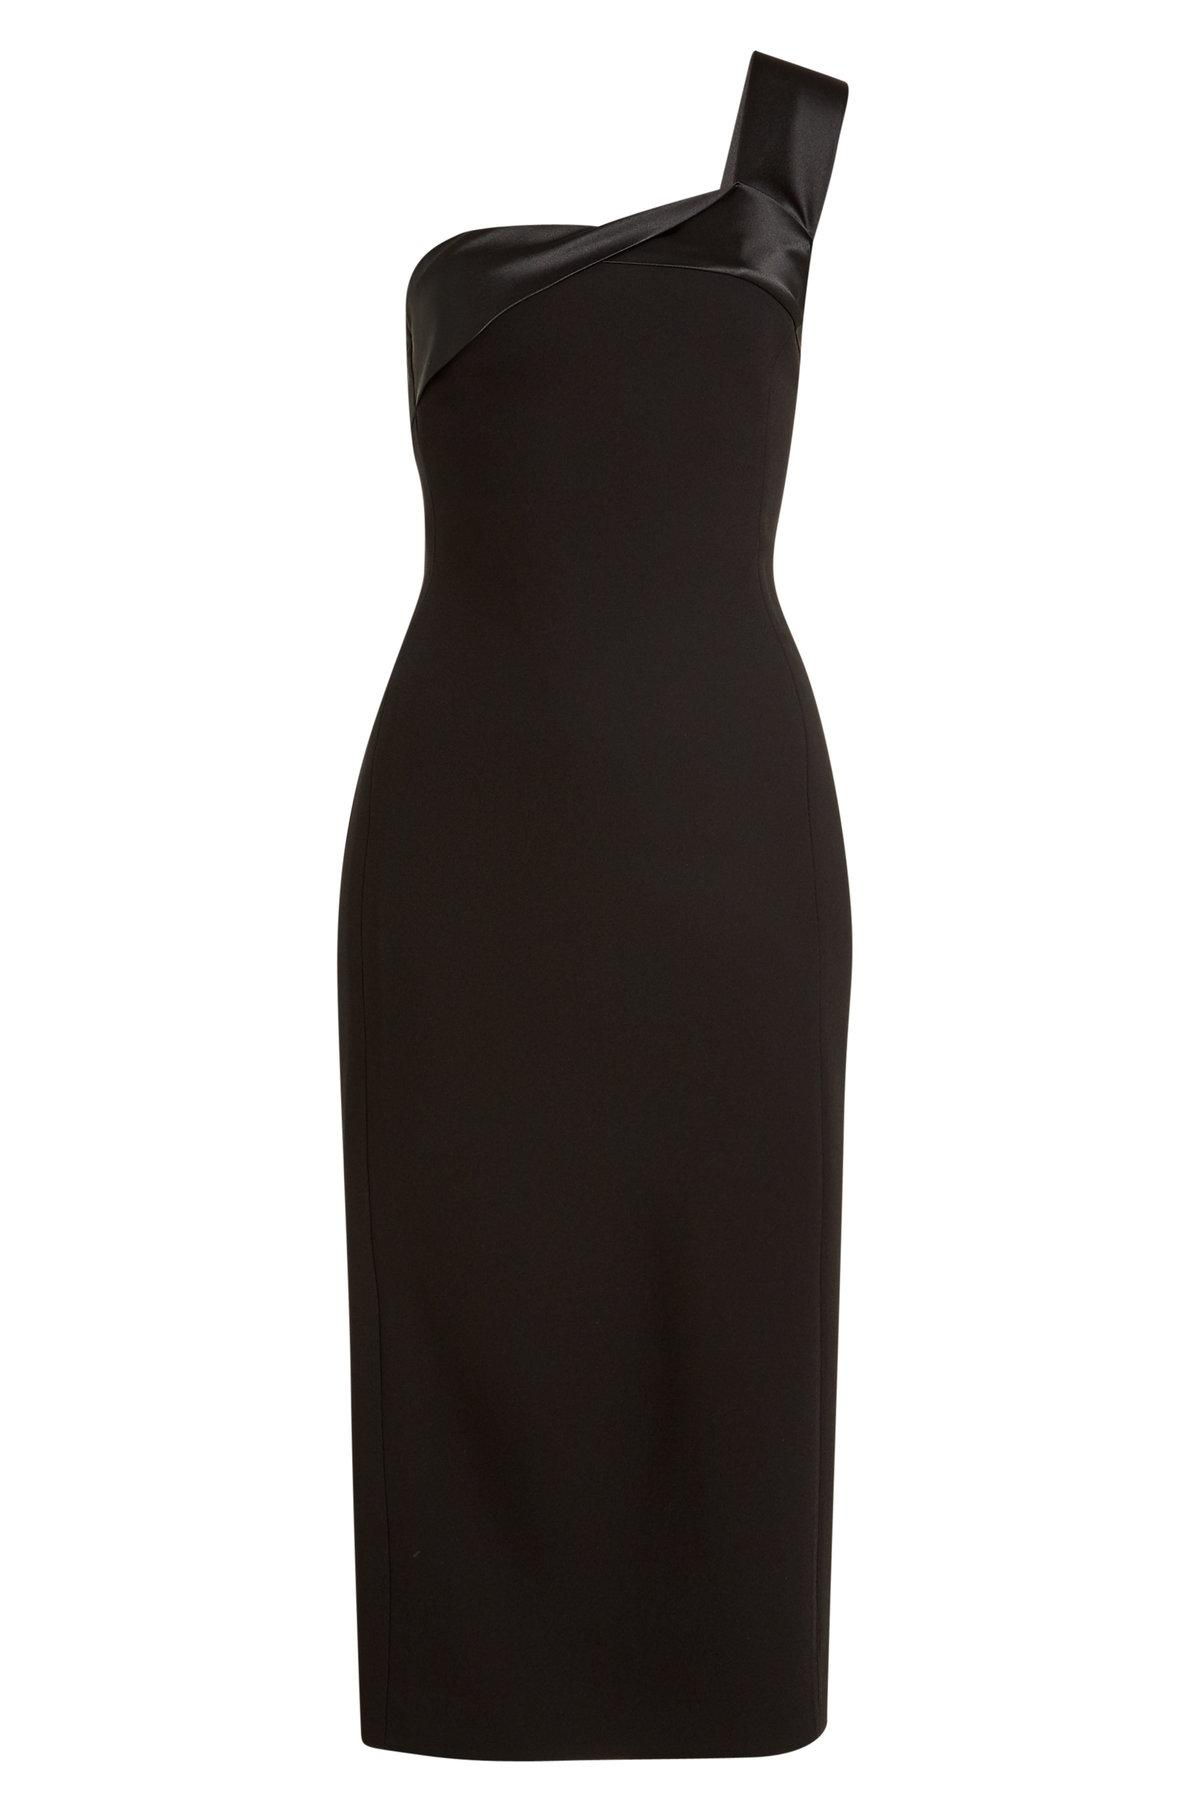 Victoria Beckham Asymmetric Dress With Satin In Black